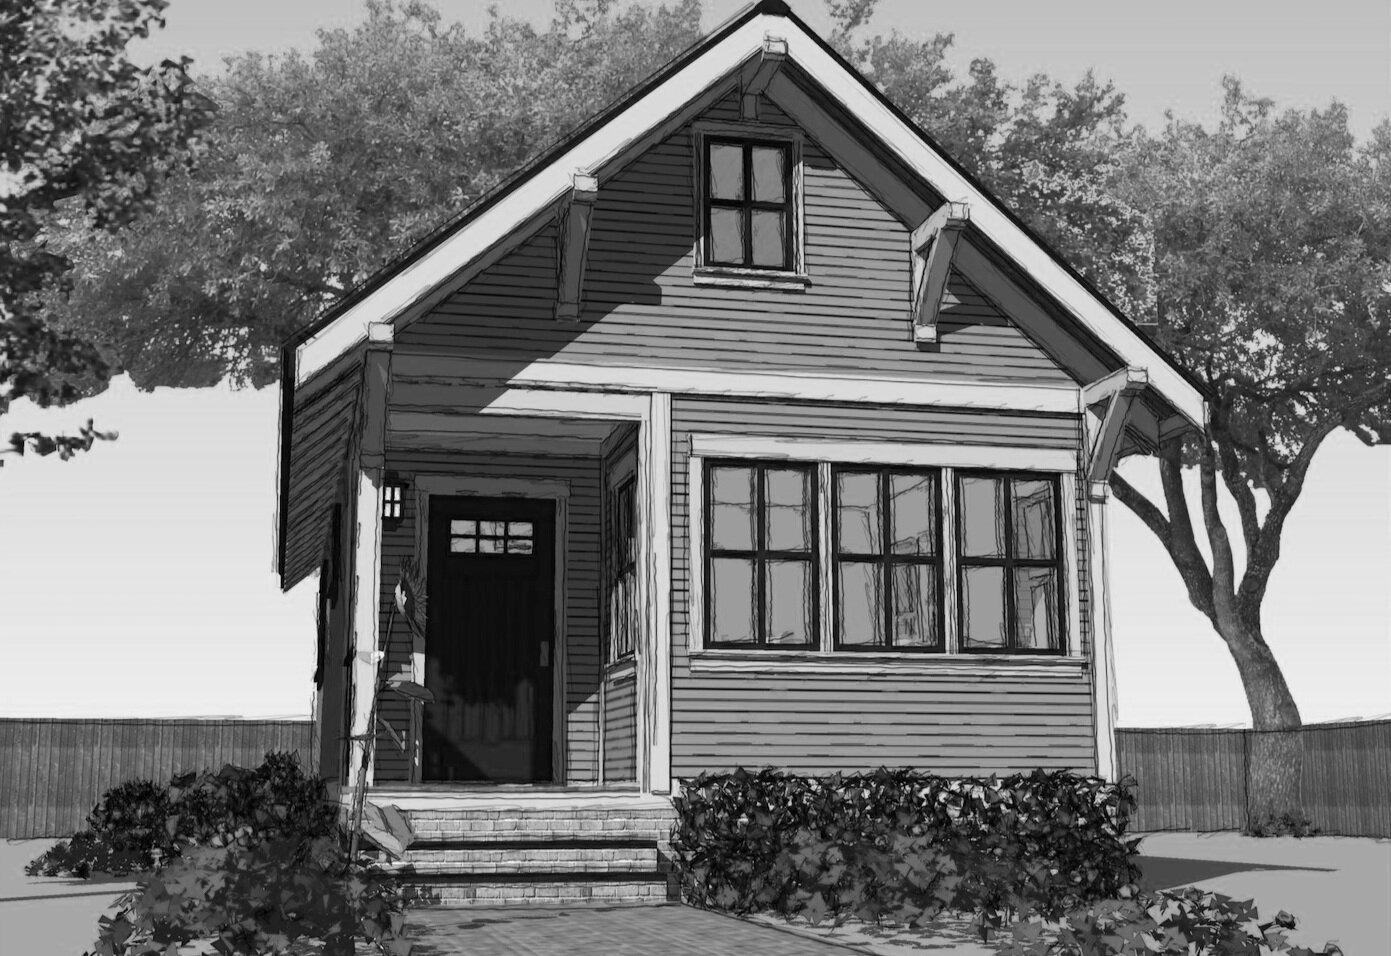 Merveilleux THE Small HOUSE CATALOG